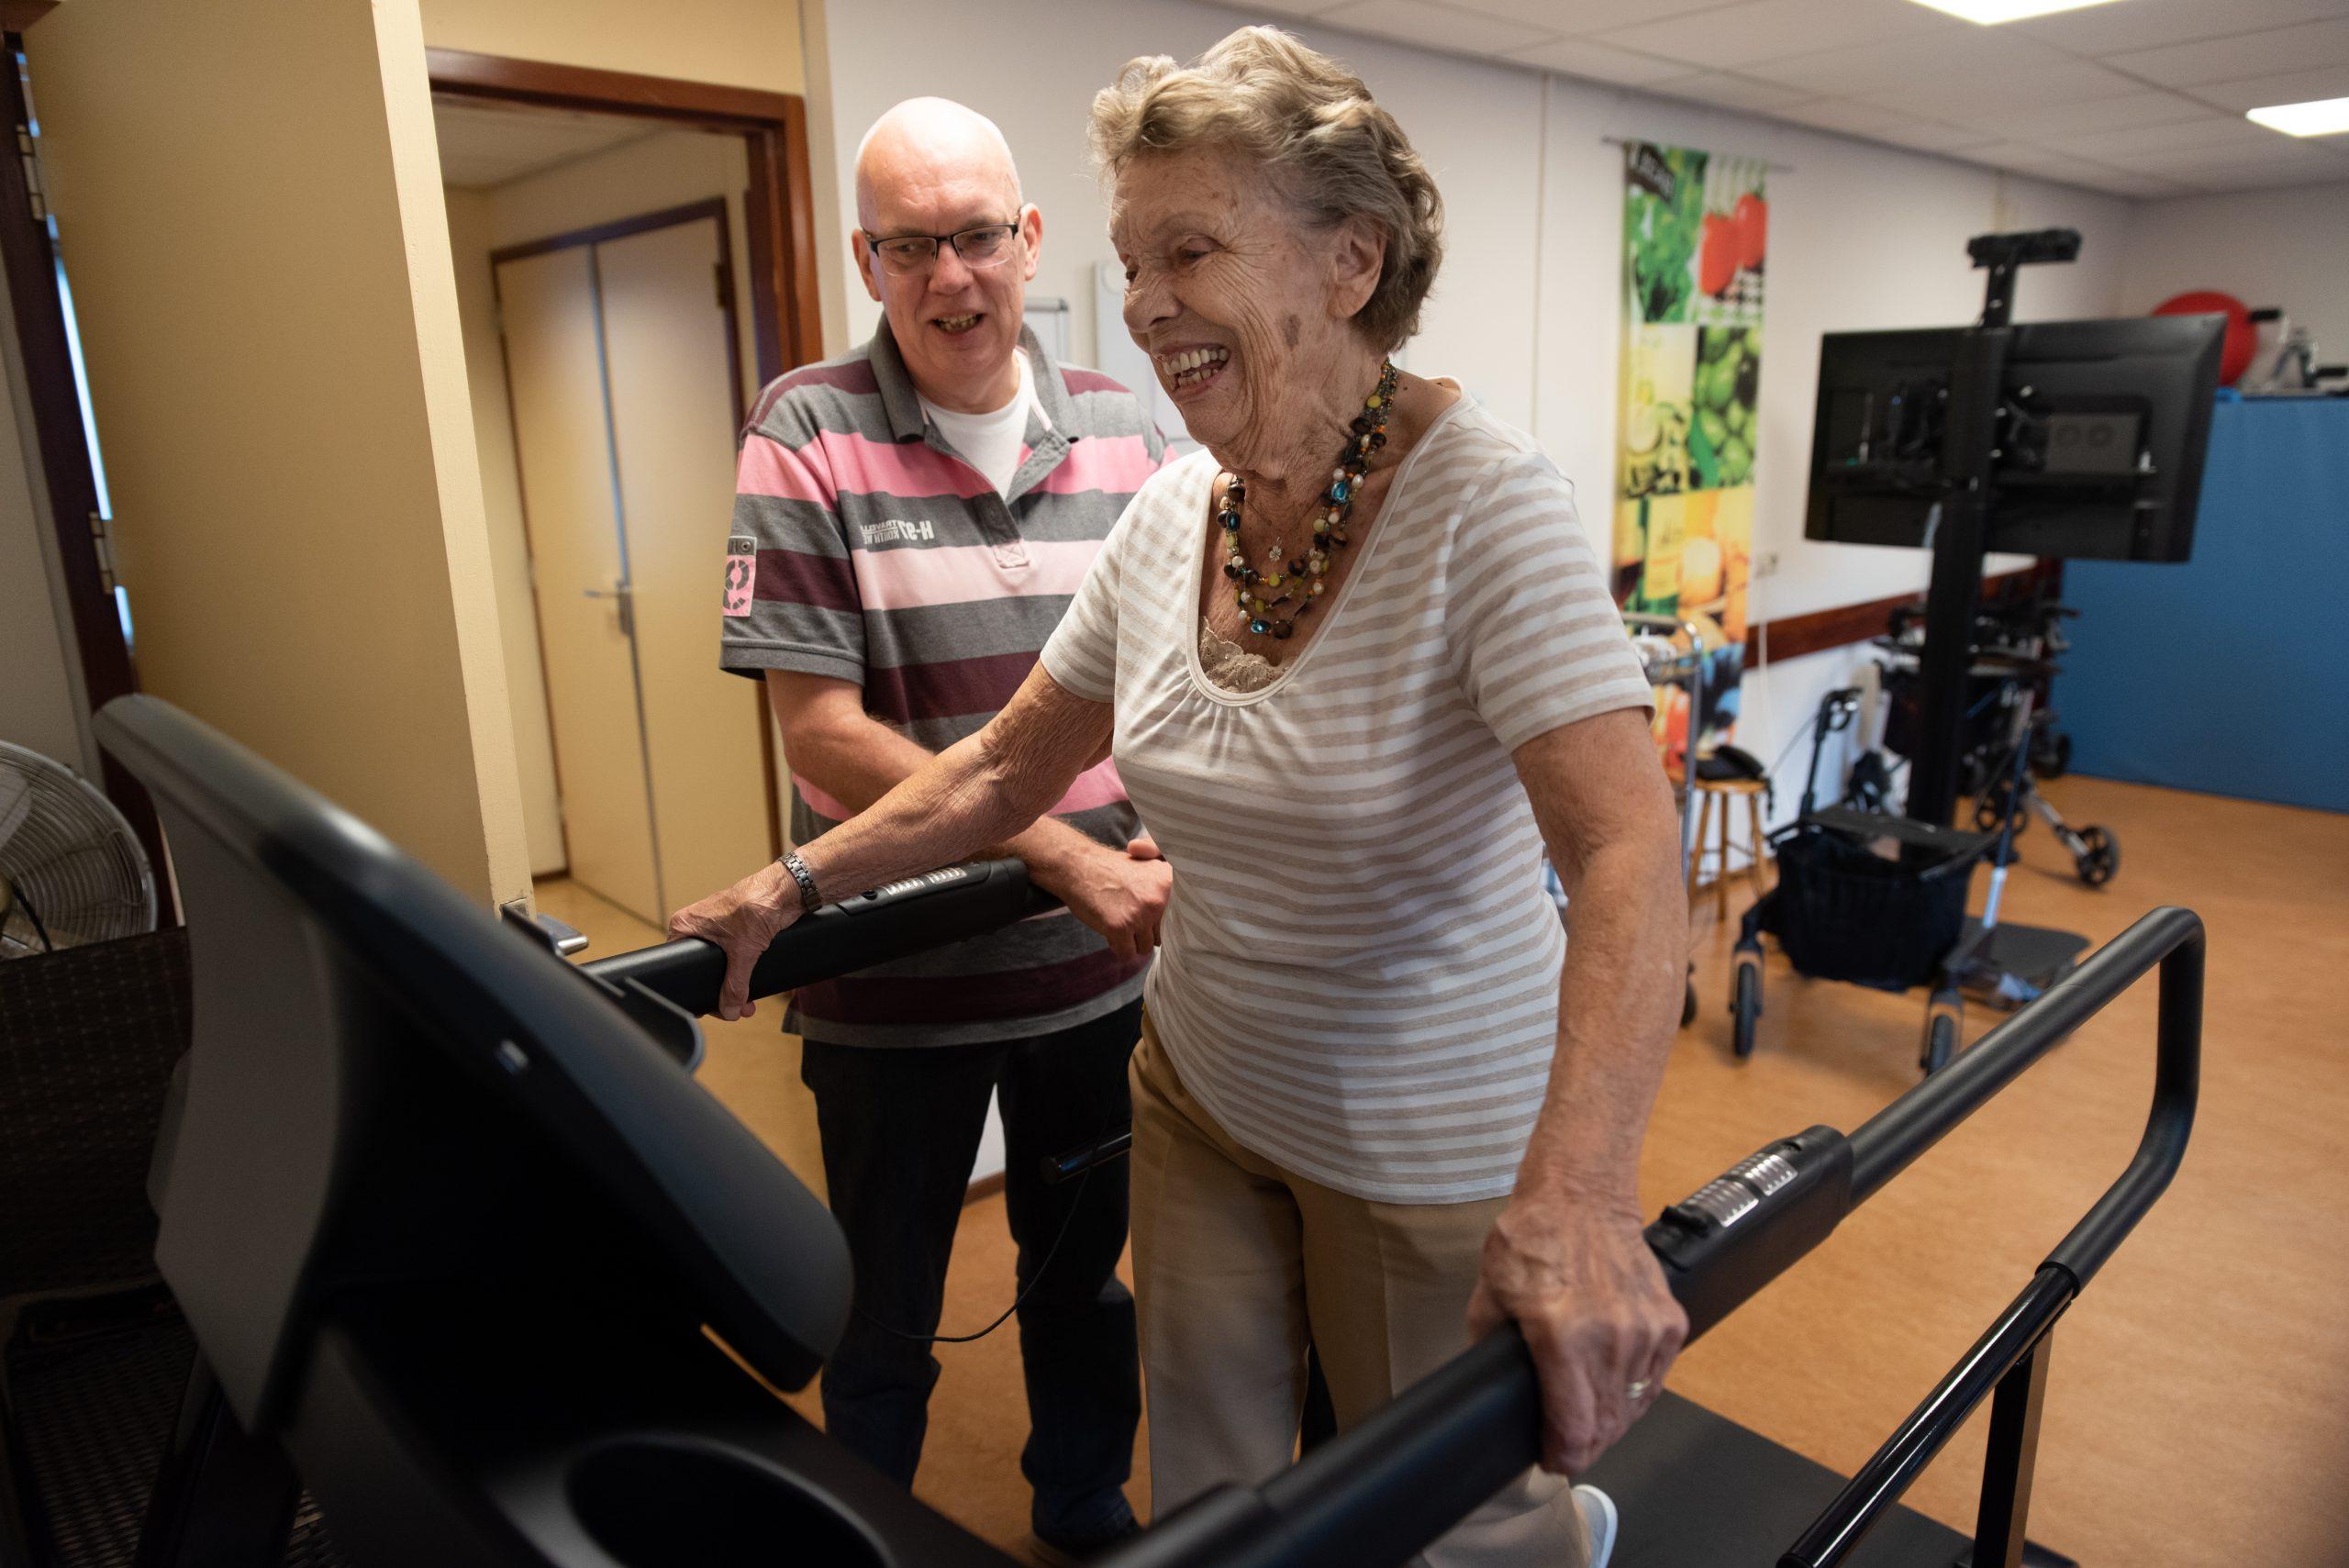 Mannelijke zorgmedewerker helpt oudere dame op loopband